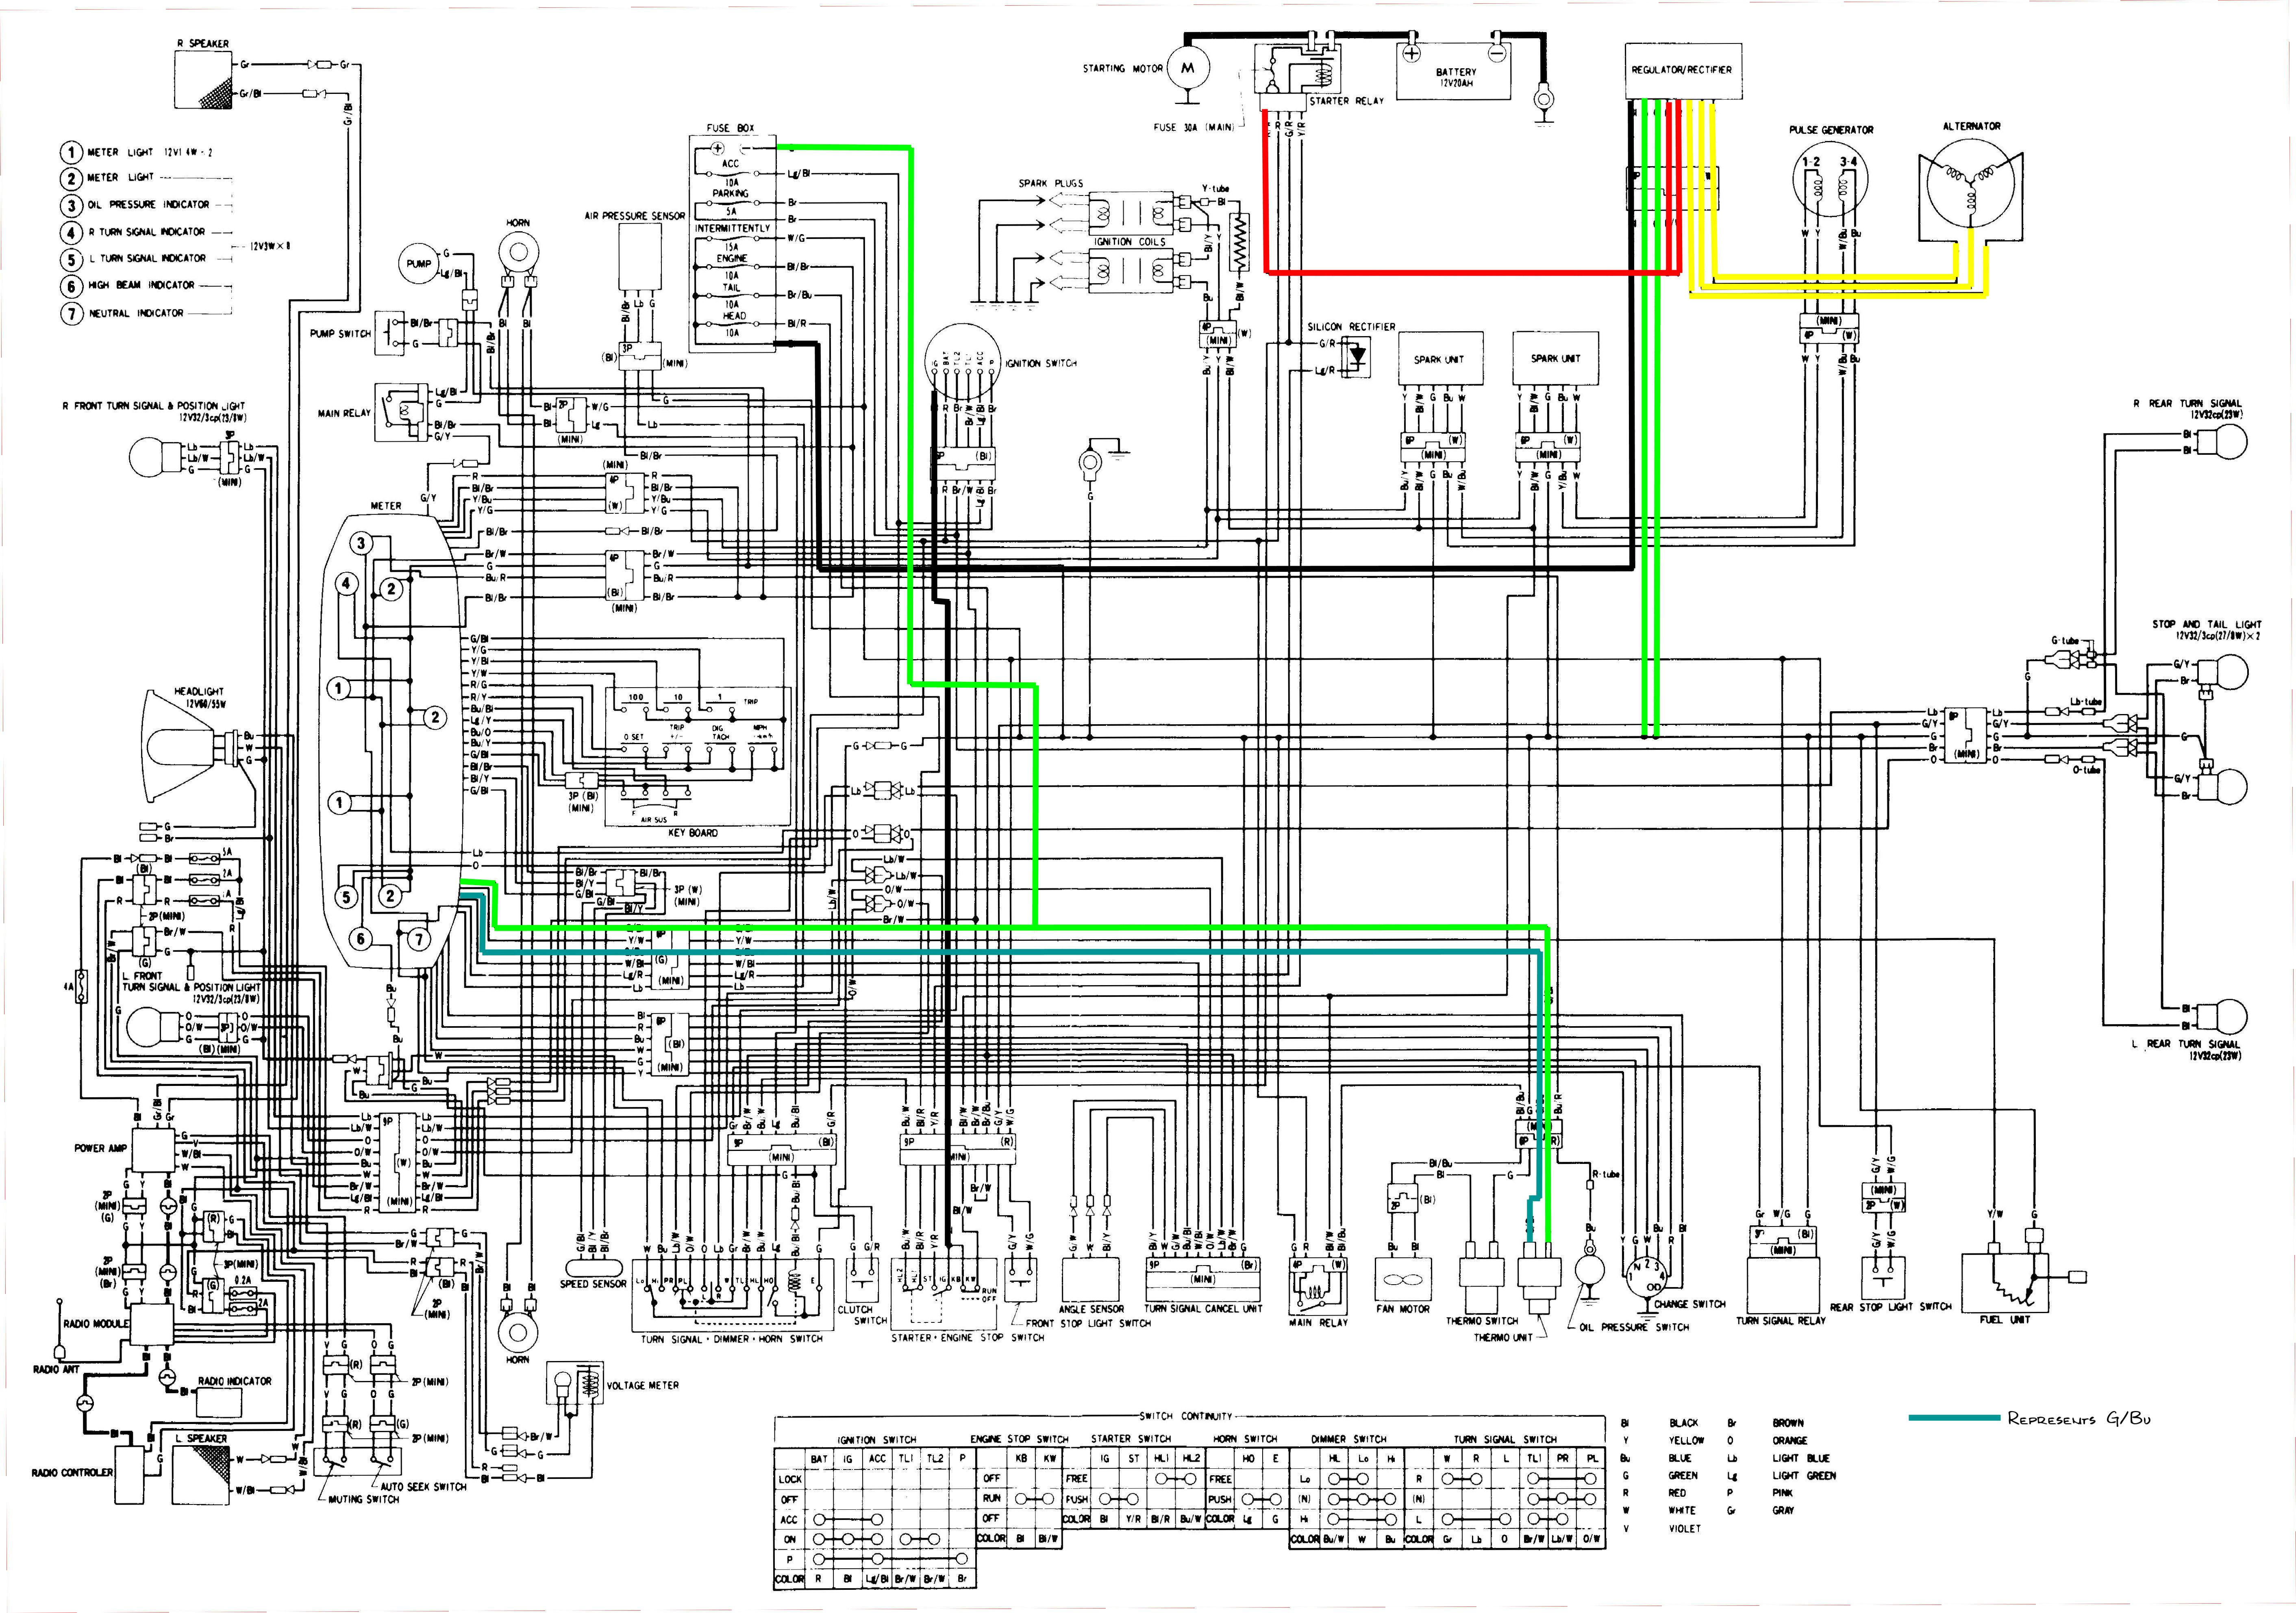 1983 gl1100a wiring diagram color reg rect3?w\\\=640 1986 gl1200 wiring diagram wiring diagram shrutiradio 1986 Goldwing 1200 at nearapp.co